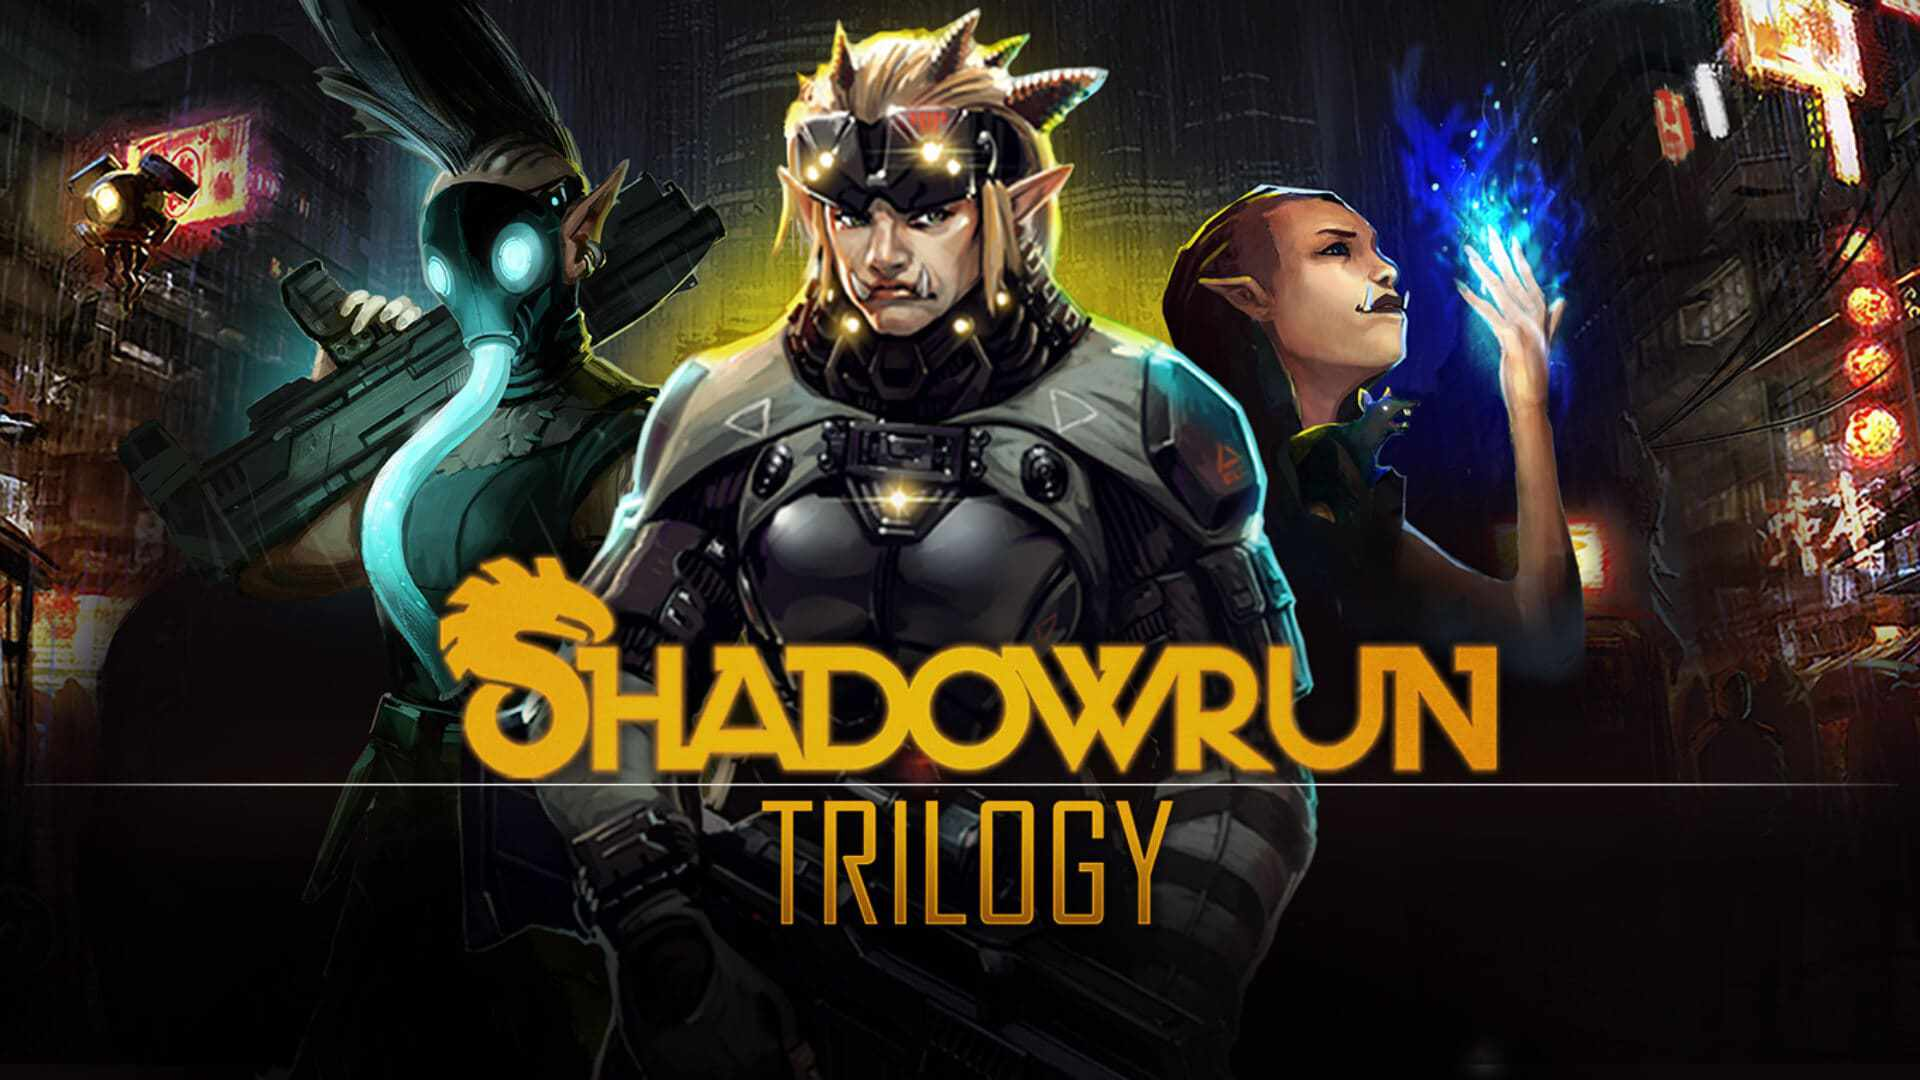 Shadowrun Trilogy